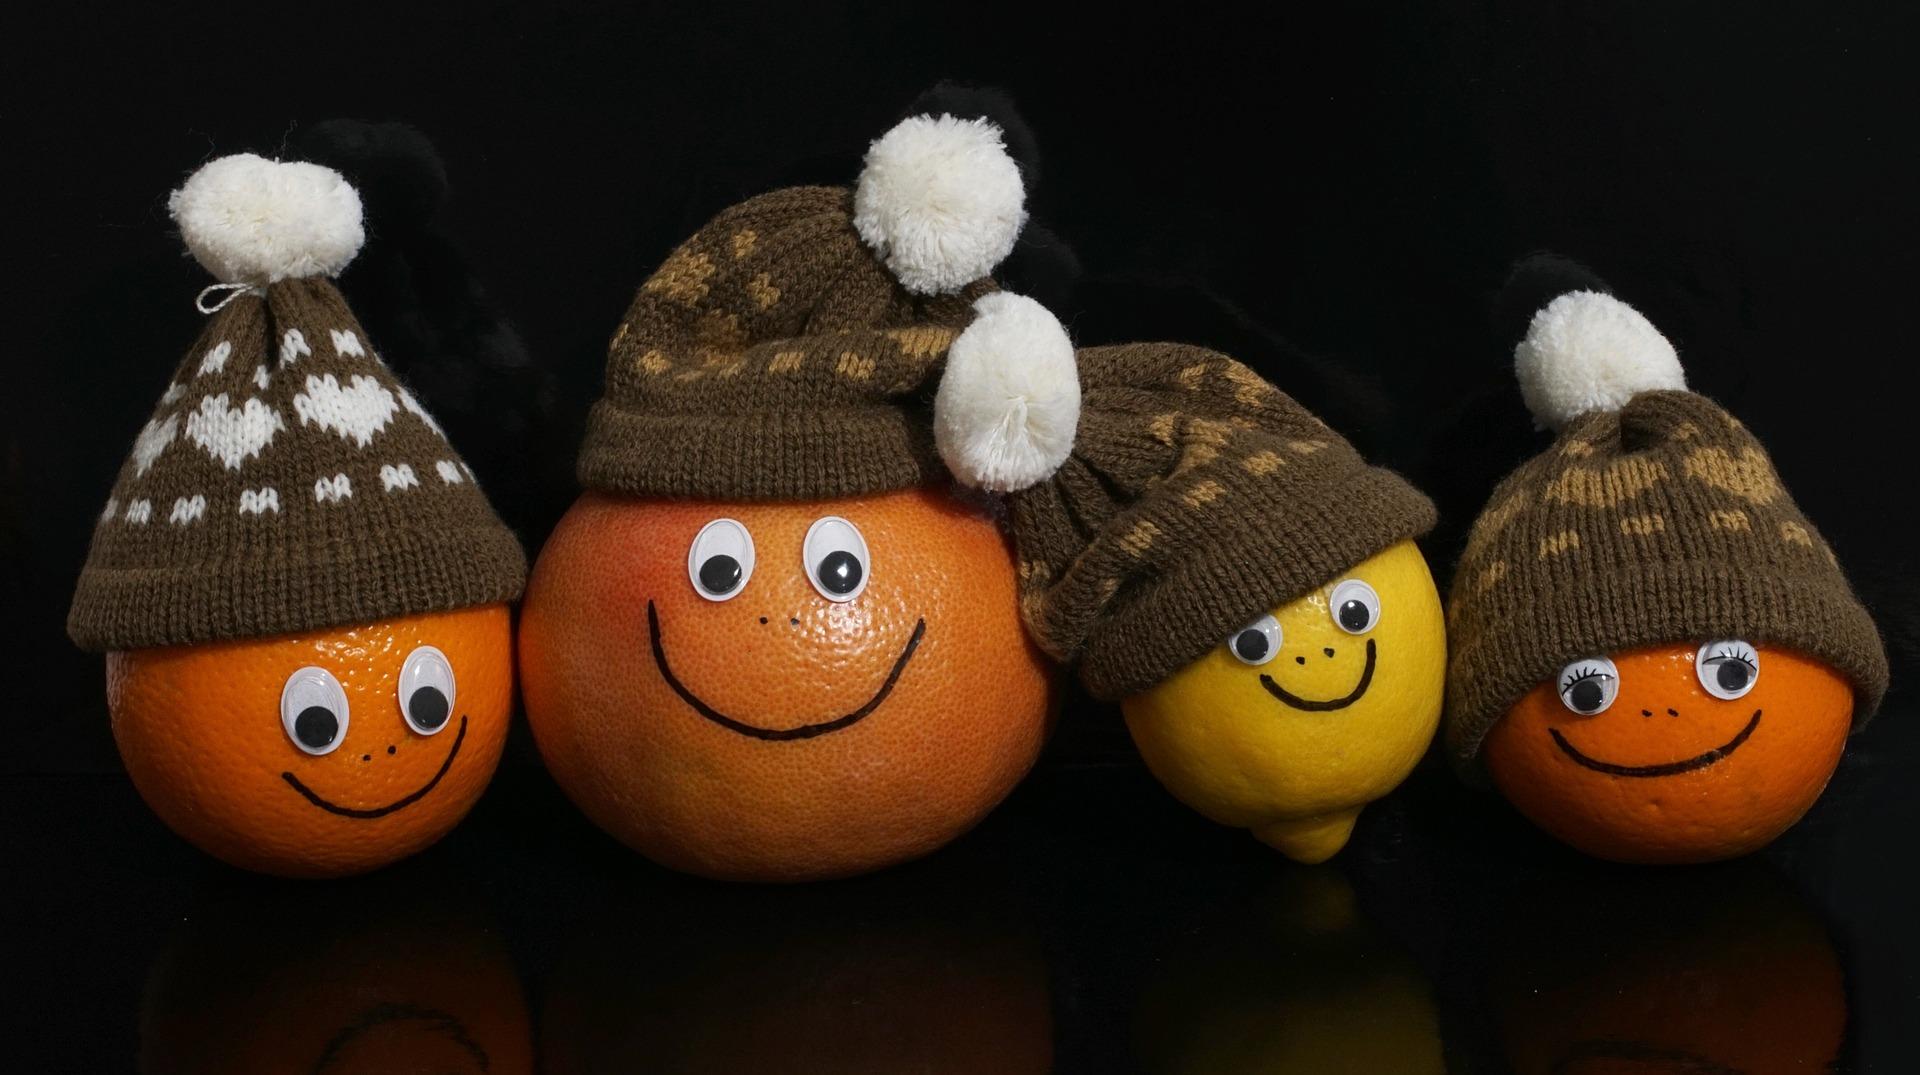 fruits lemon orange